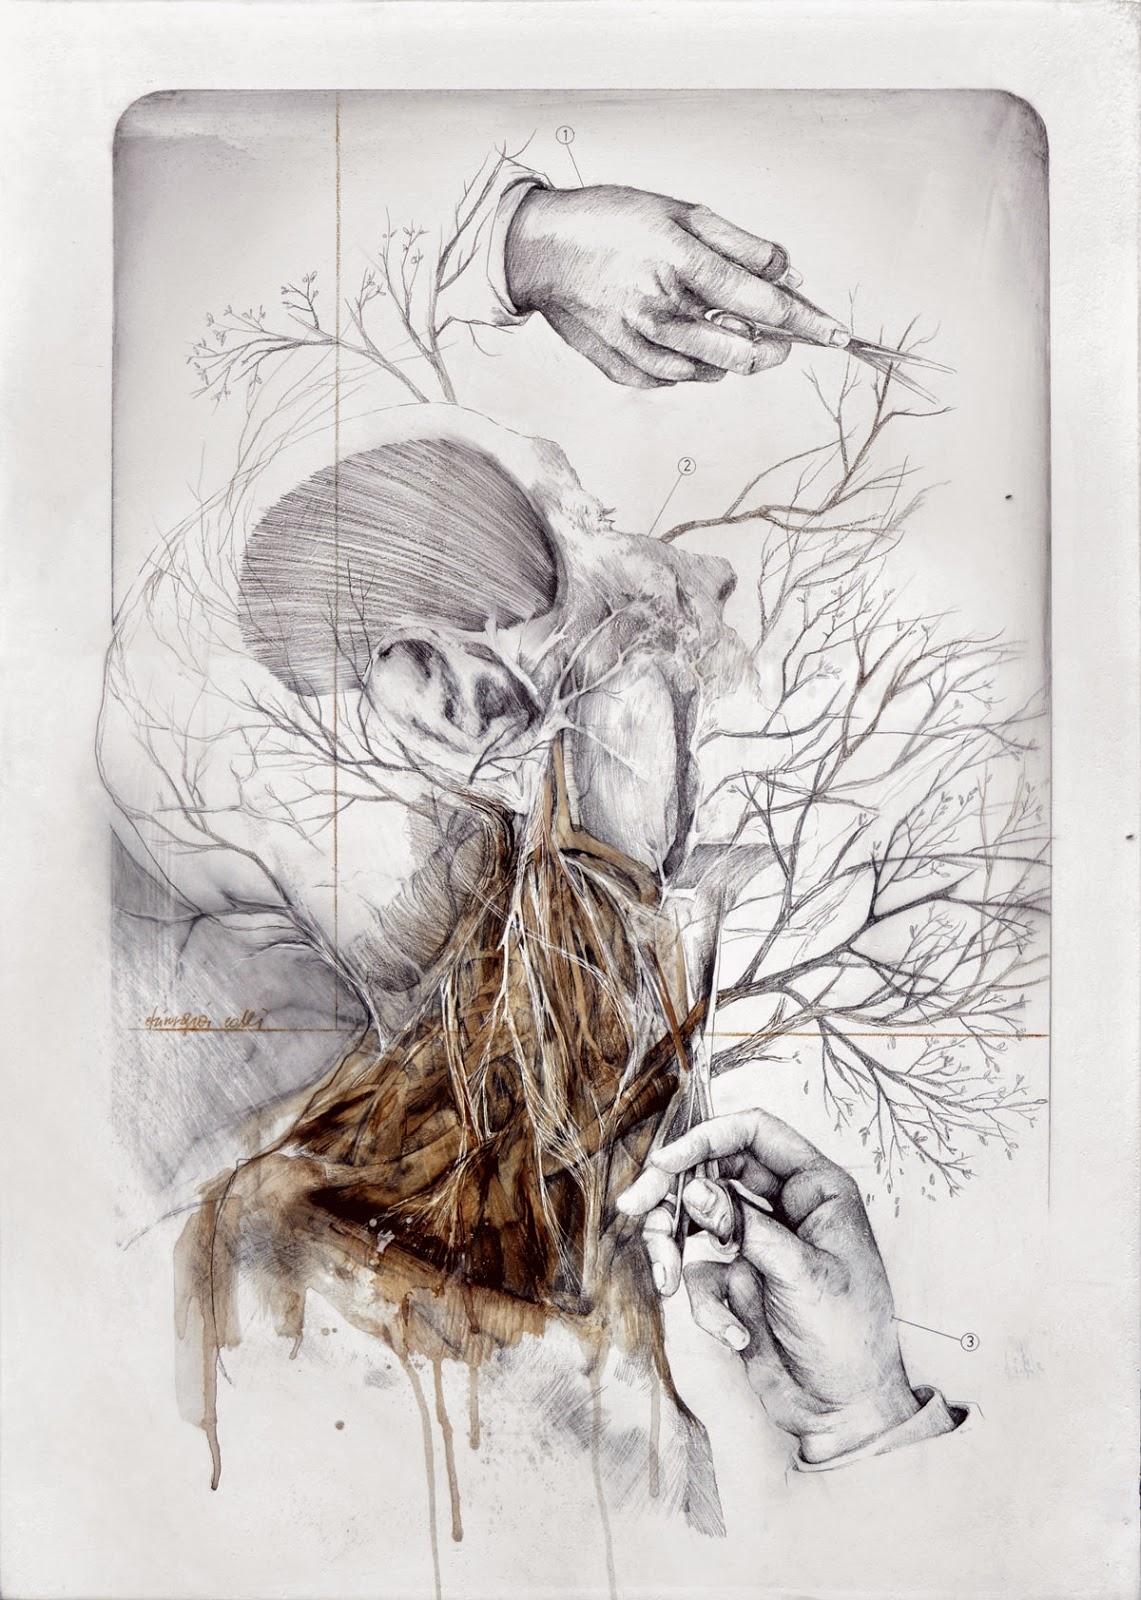 nunzio-paci-human-illustration 9